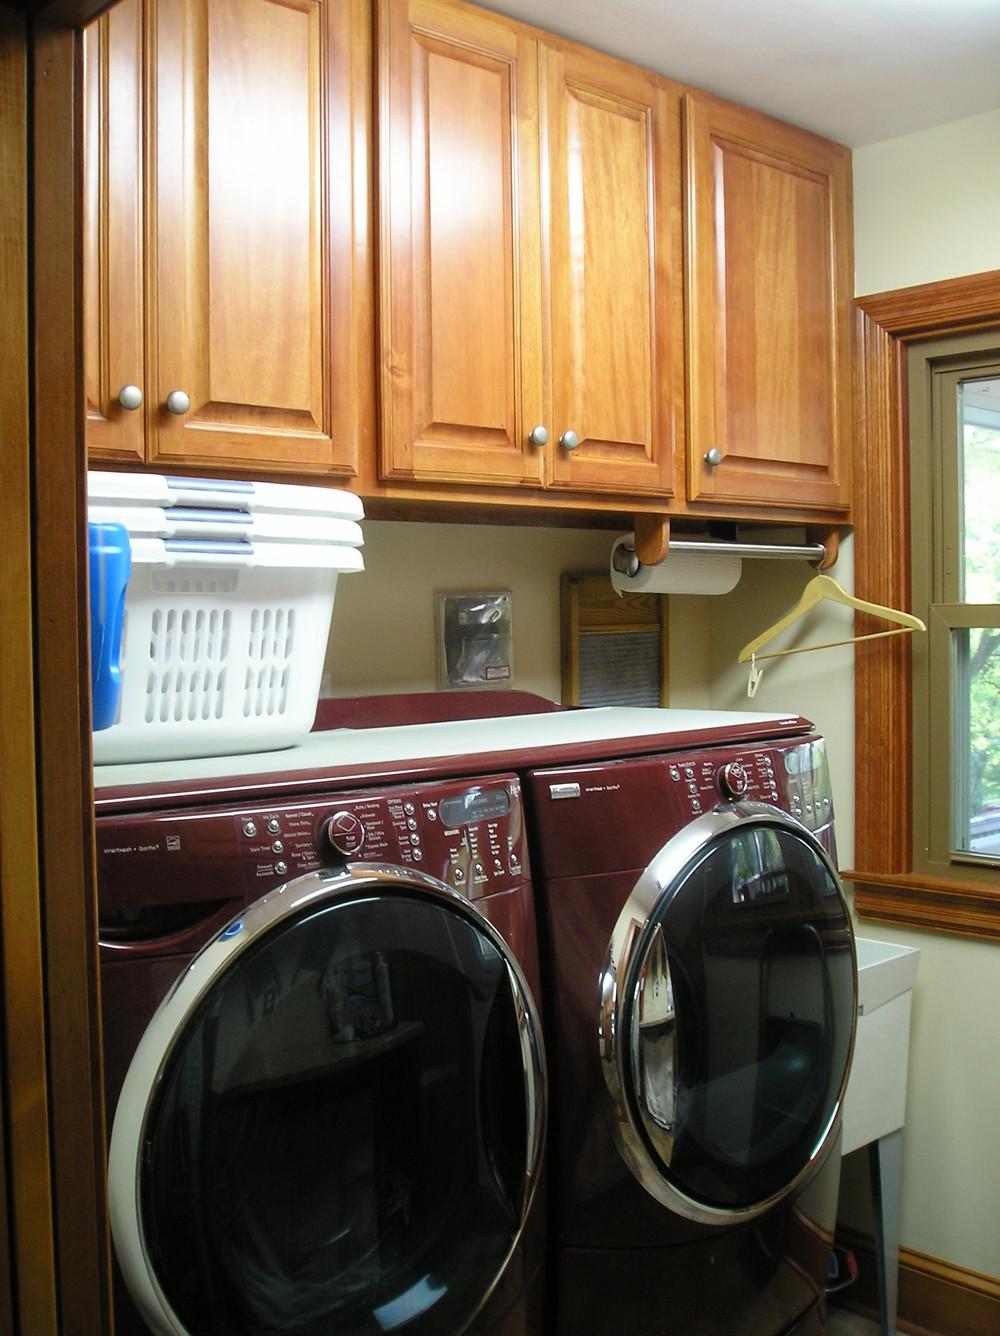 39 Laundry Room 2012_07.JPG